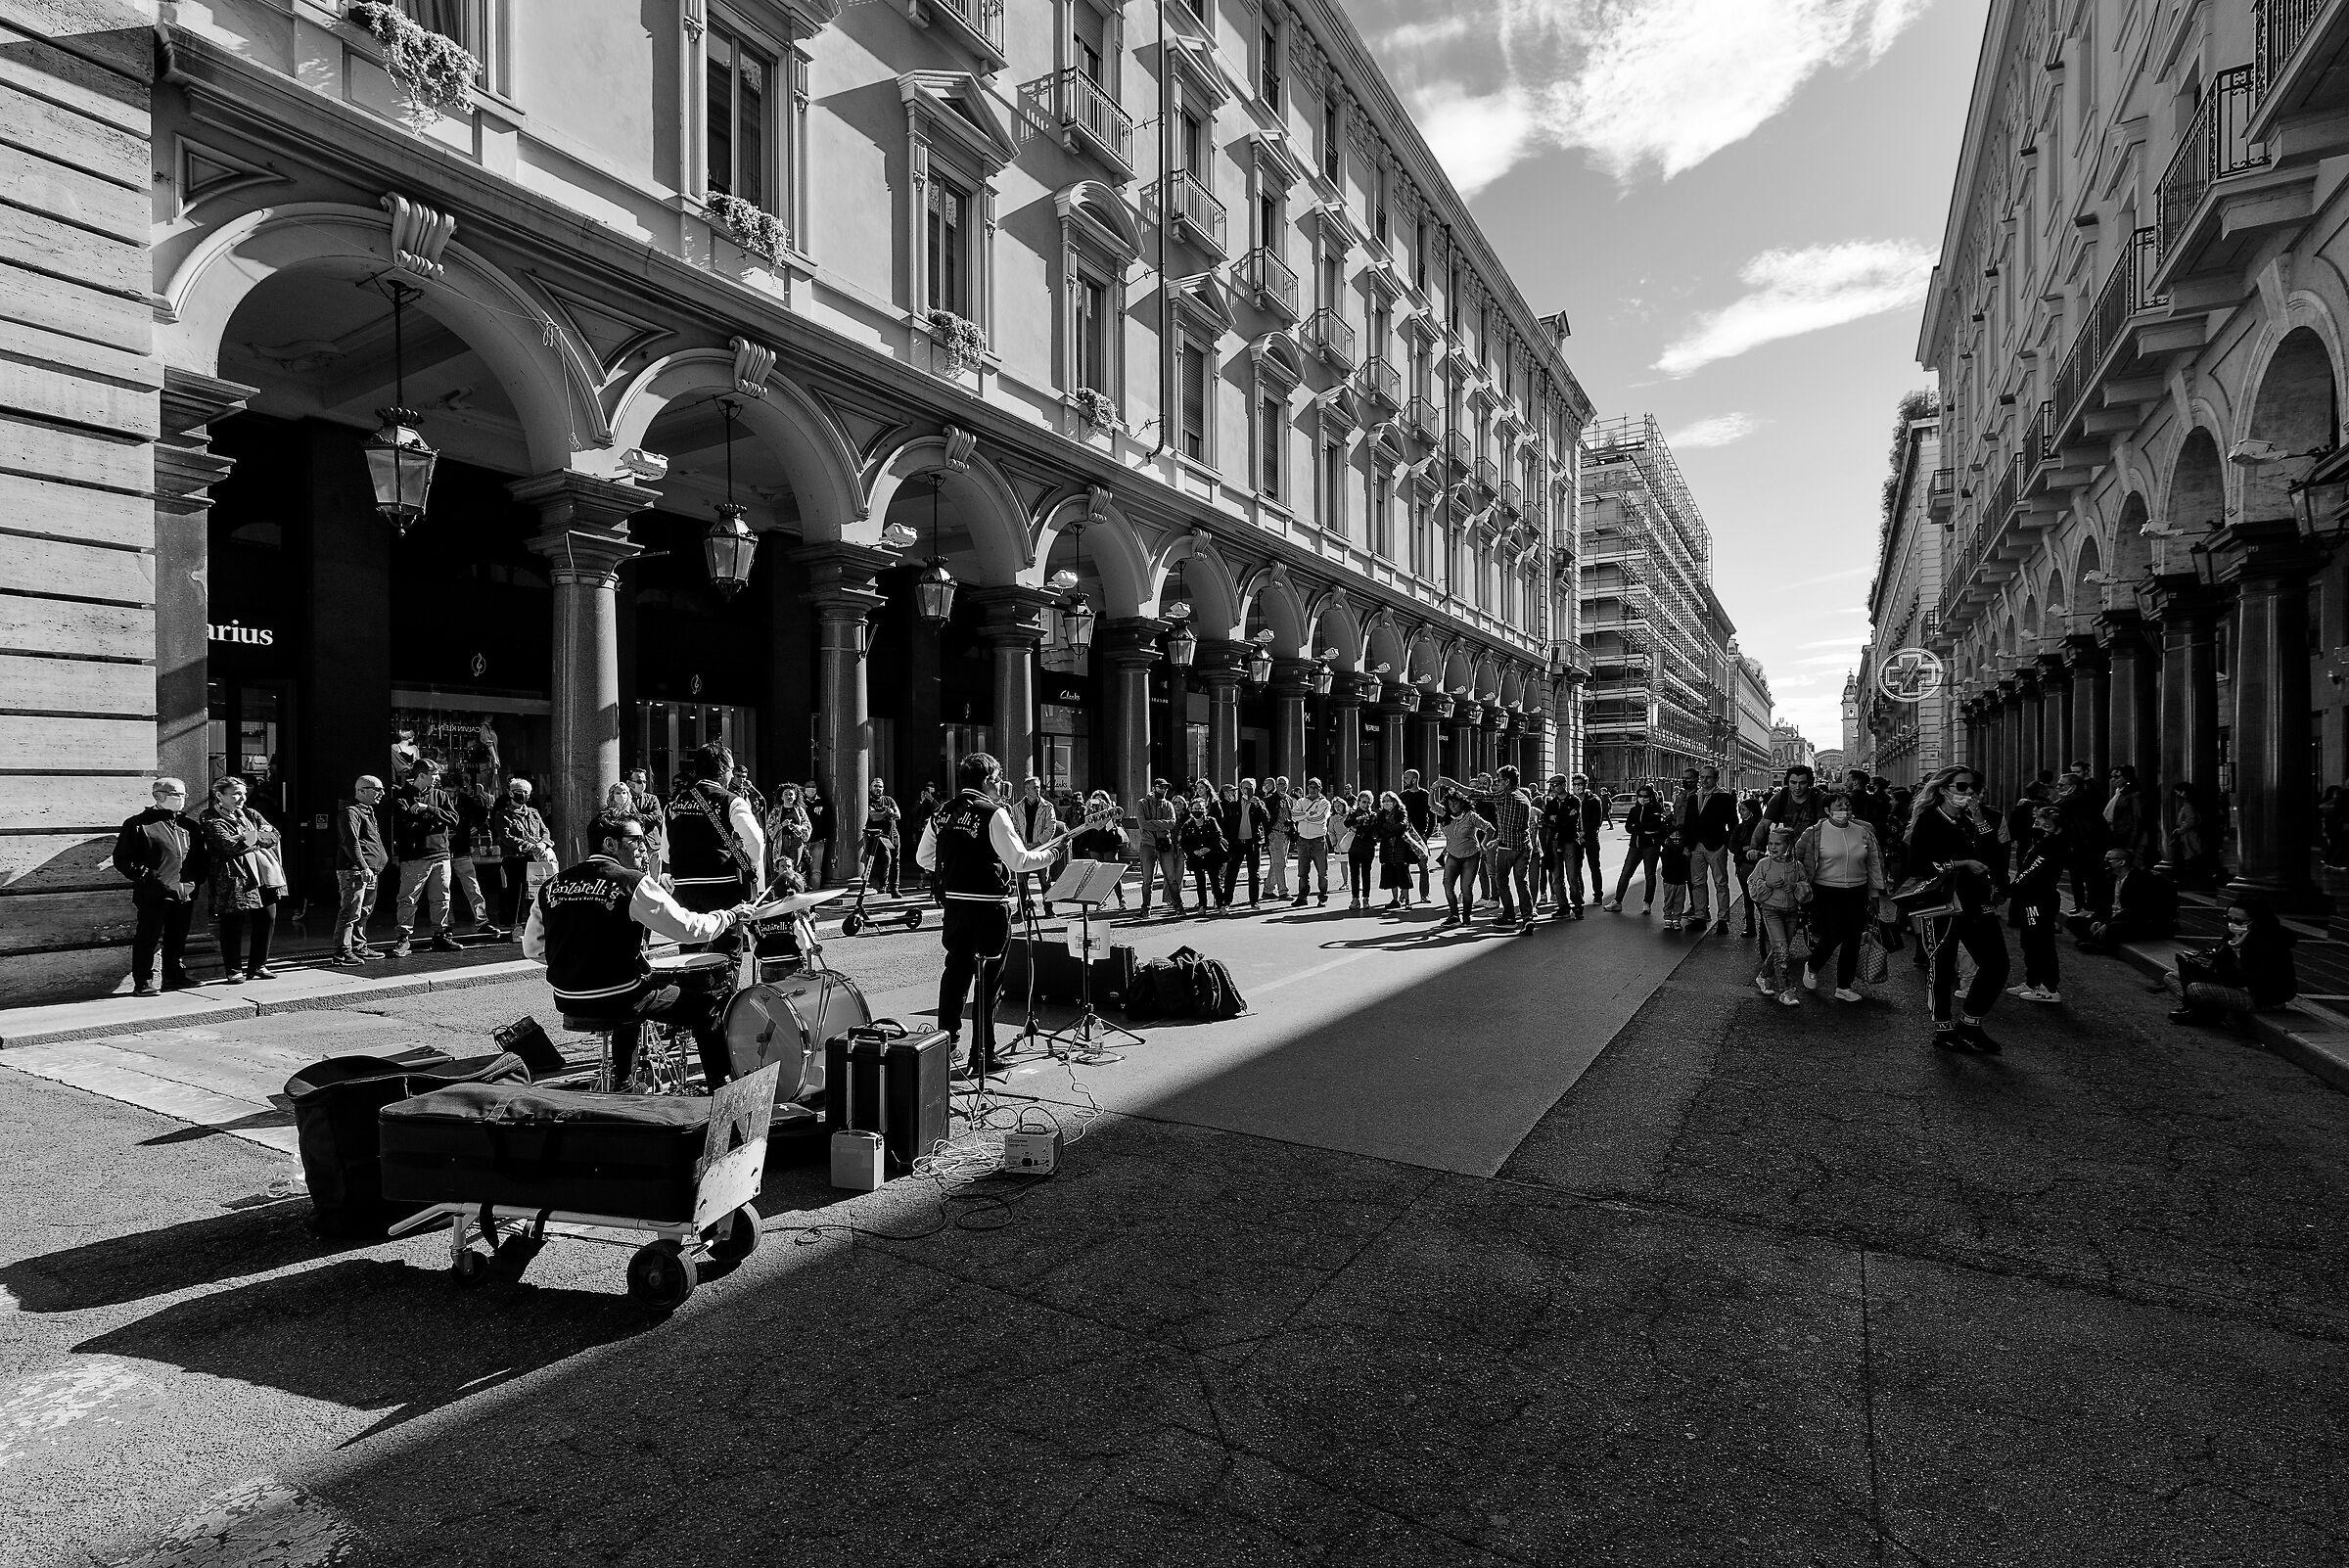 Street artists in Turin...